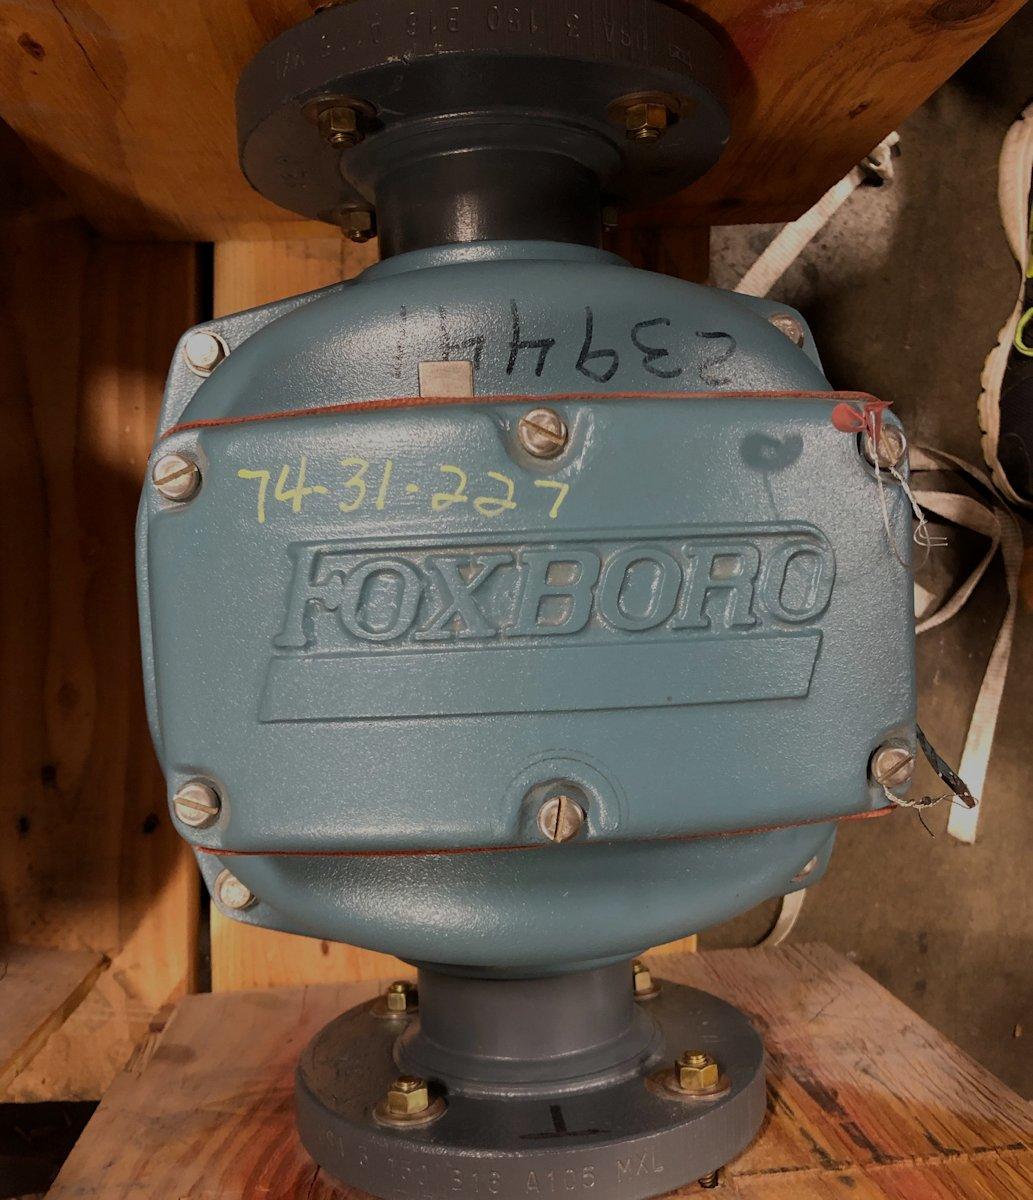 Foxboro 8303SABA-TTJ-GFGZ 3in CL150 DC Magnetic Flowtube